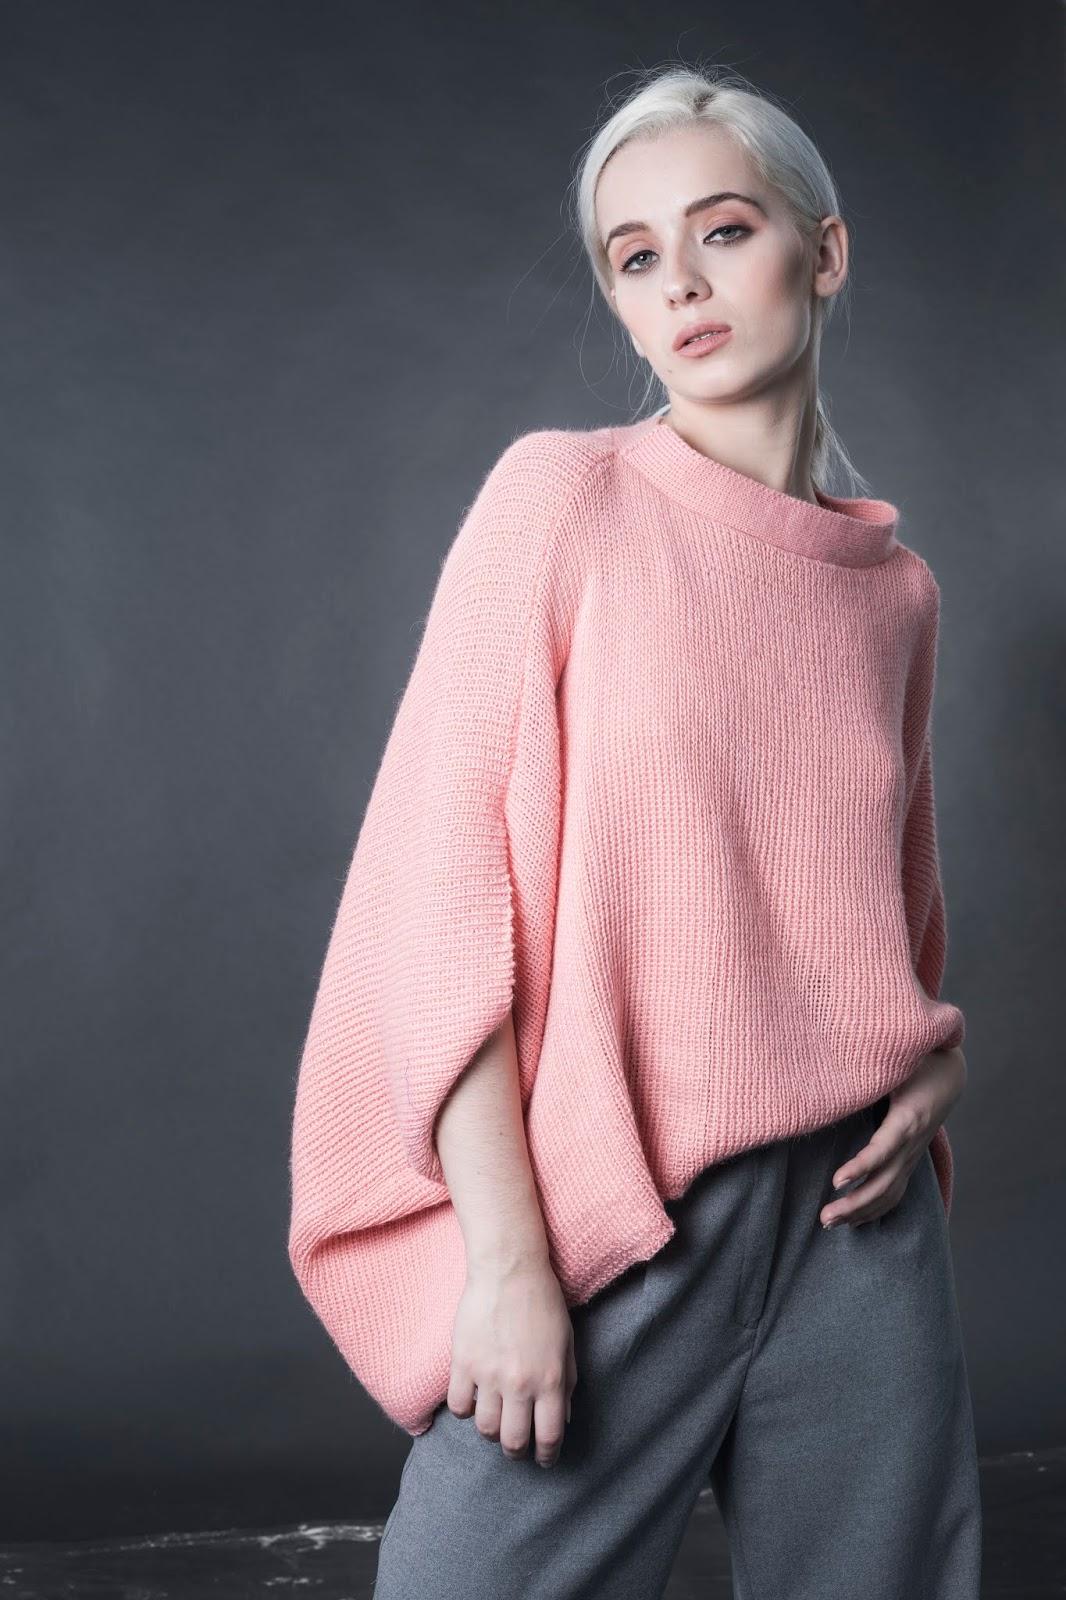 Bafweek otoño-invierno 2012 - Día 1 - Paula Ledesma